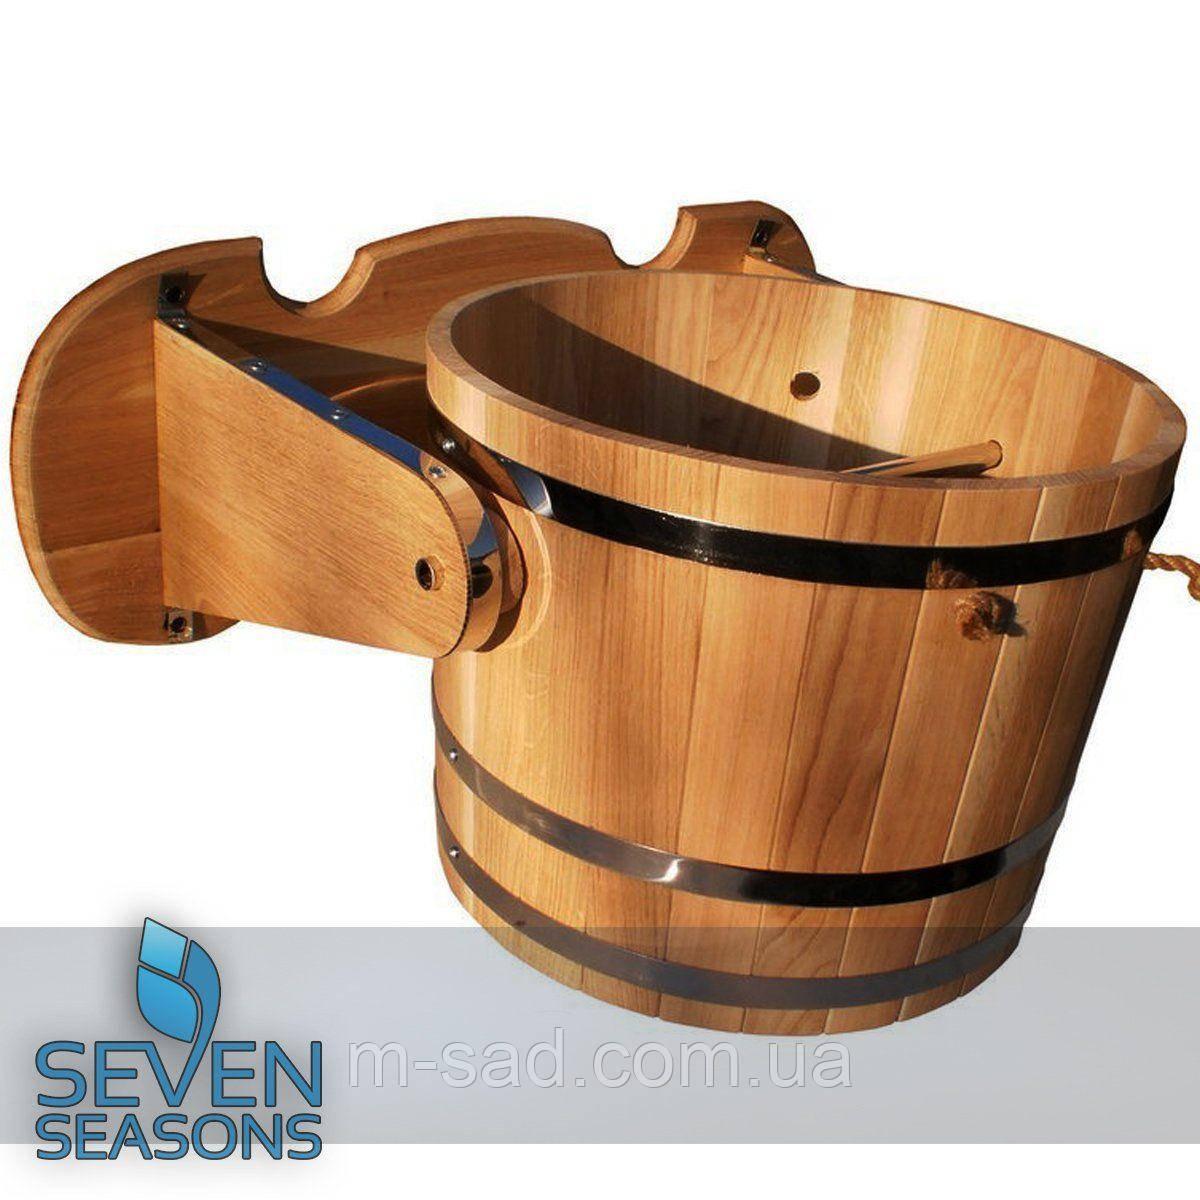 Ведро-водопад для бани из дуба Seven Seasons™, 20 литров